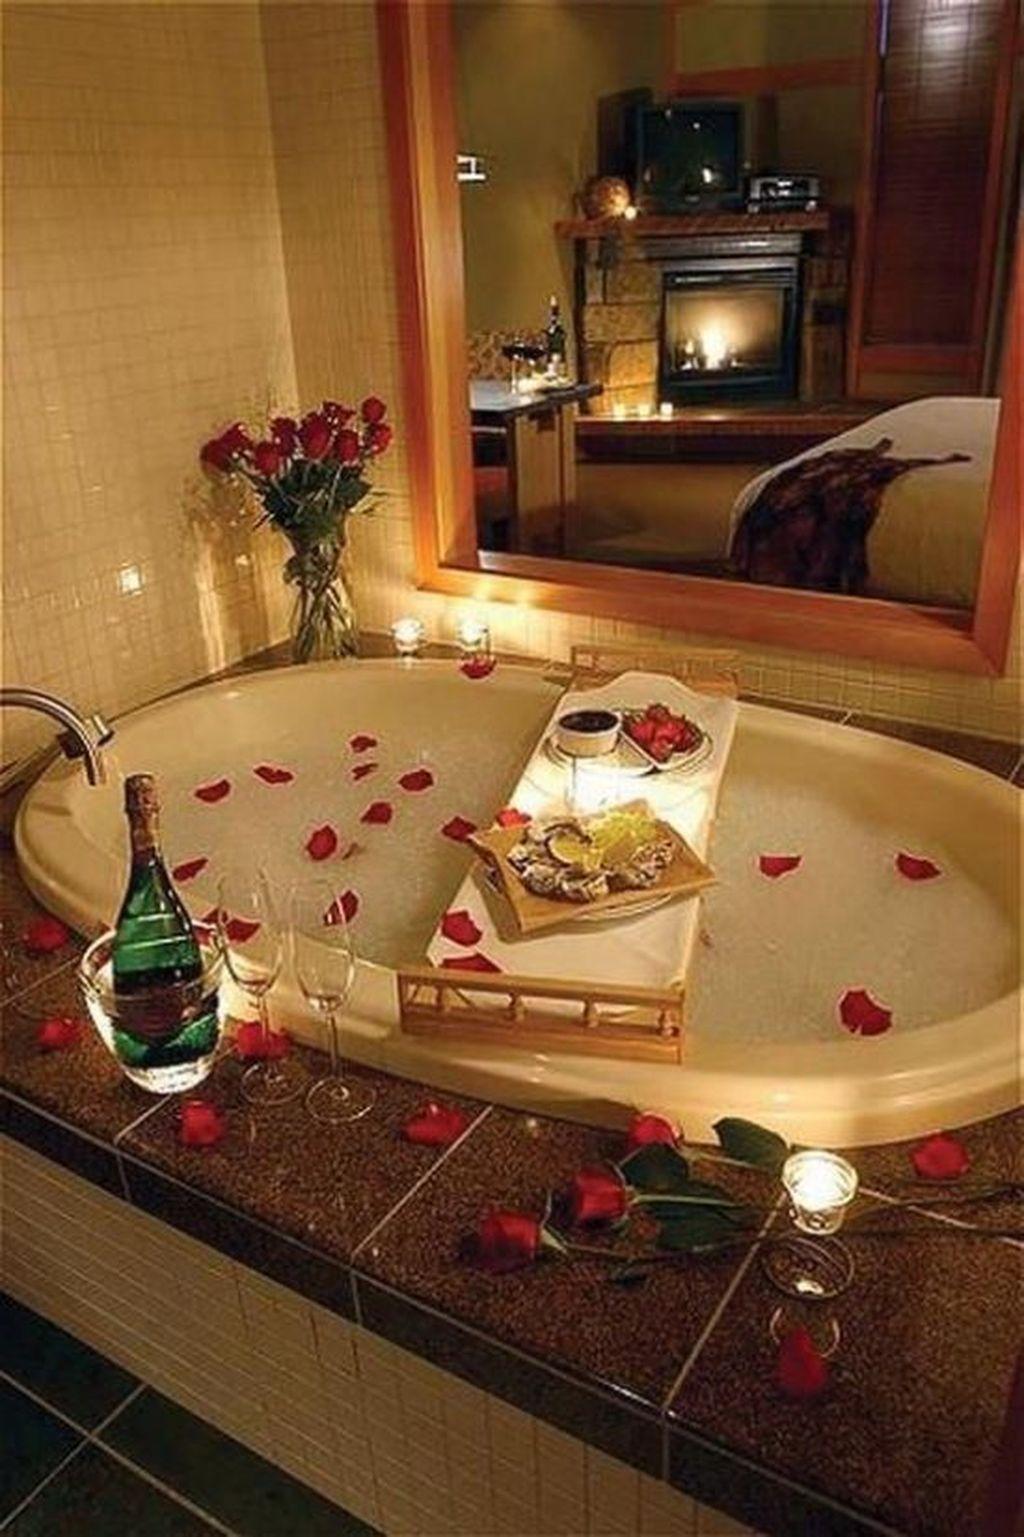 7 Cute Bathroom Decoration Ideas With Valentine Theme - HOMYHOMEE